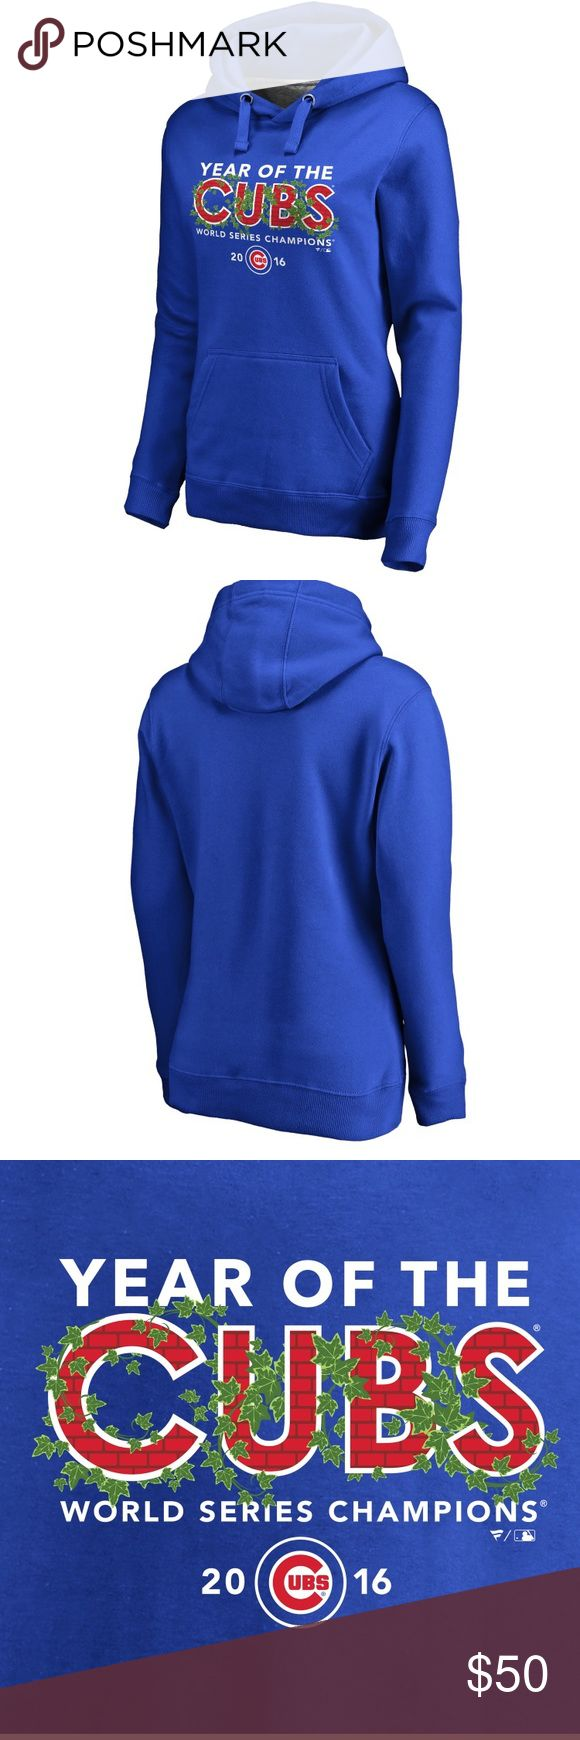 NWT! Chicago Cubs! Fanatics hoodie! Medium! NWT! Chicago Cubs! Fanatics hoodie! Medium! Just in time for opening day! fanatics Tops Sweatshirts & Hoodies